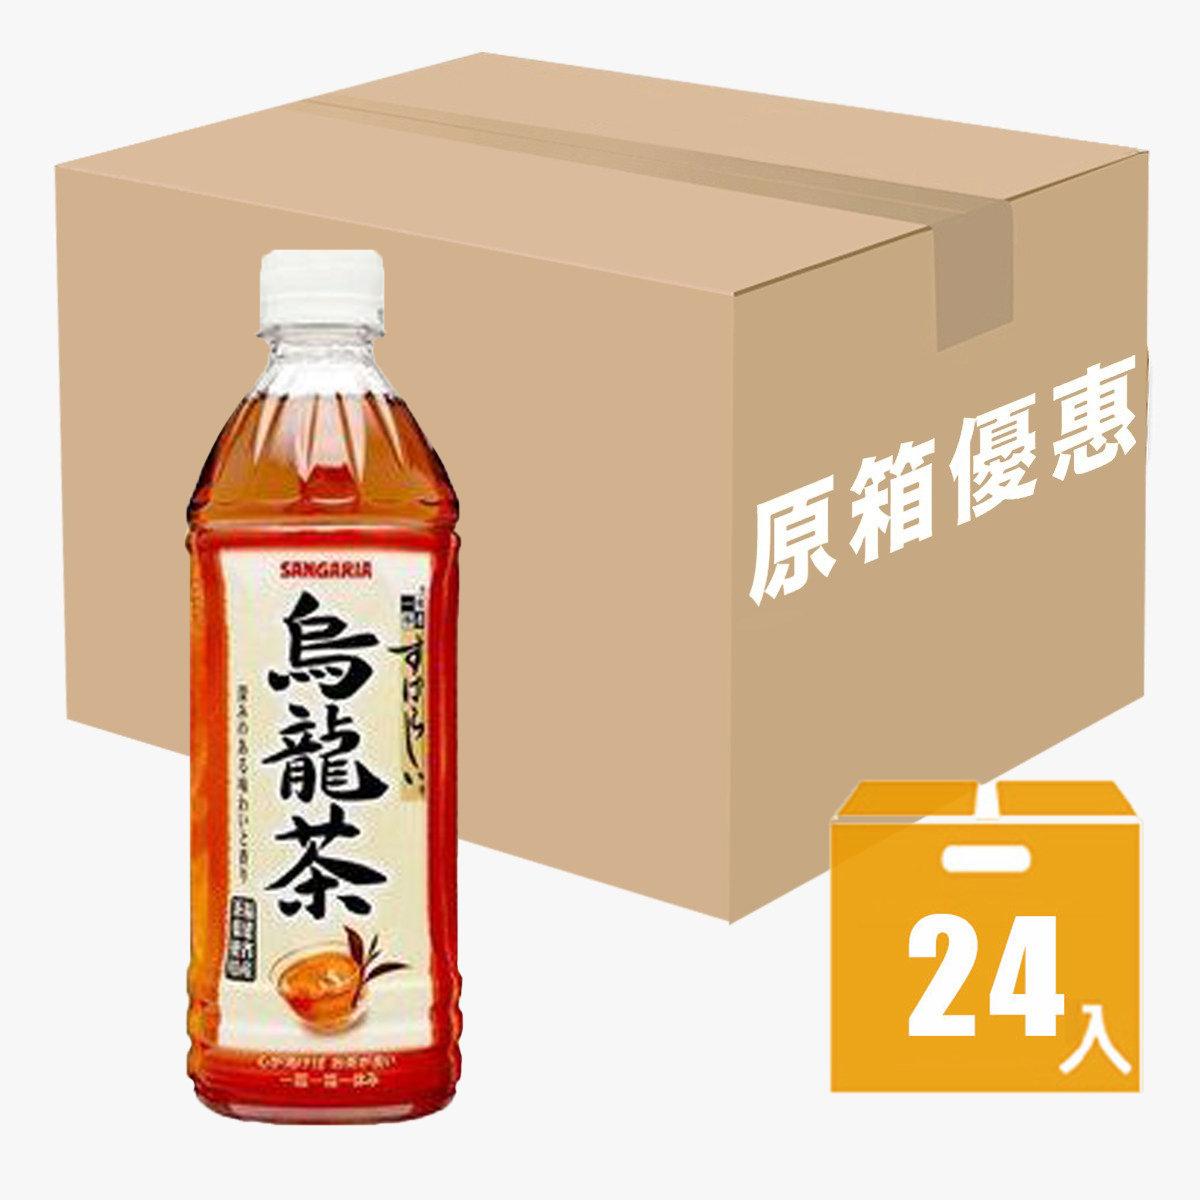 Oolong Tea 500ml x 24 (expiry date: 12/2020)